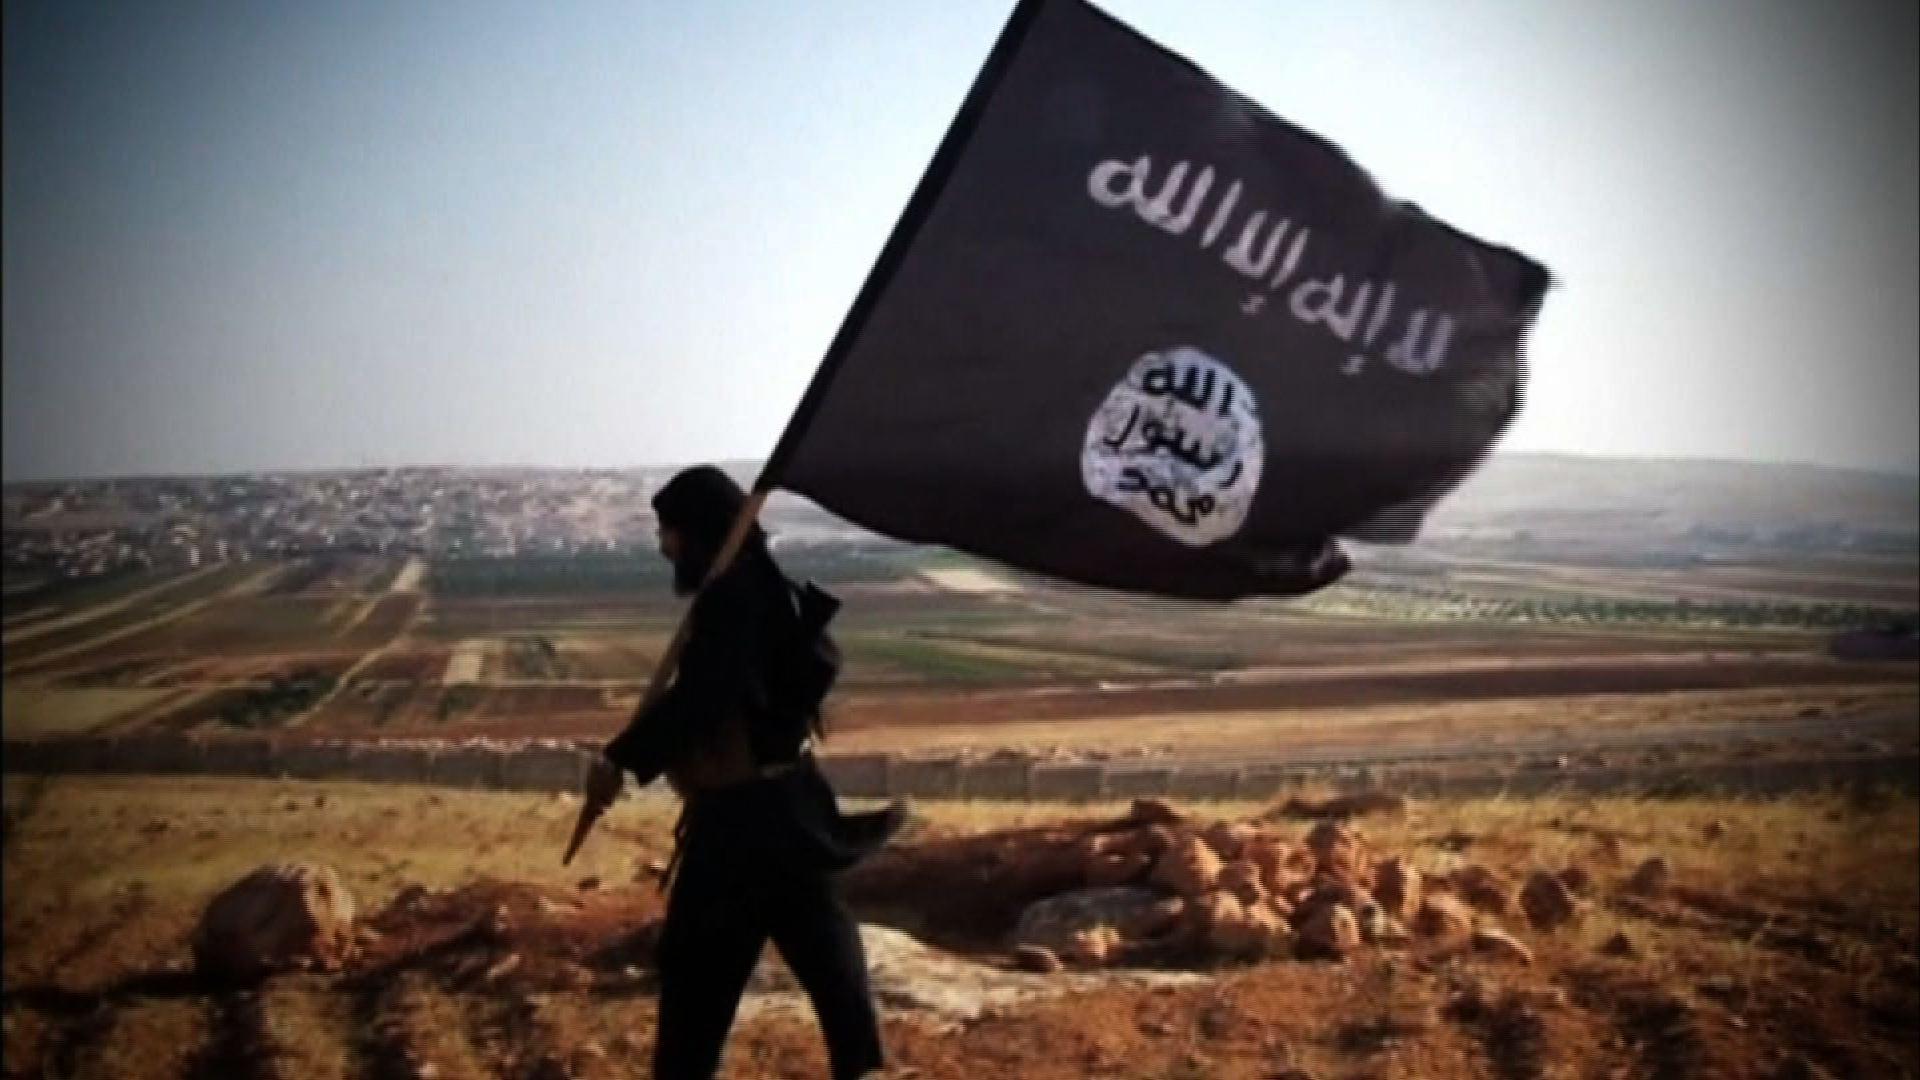 Baba Vanga ar fi prezis aparitia Statului Islamic. Ce ar fi spus batrana despre jihadisti, potrivit presei australiene